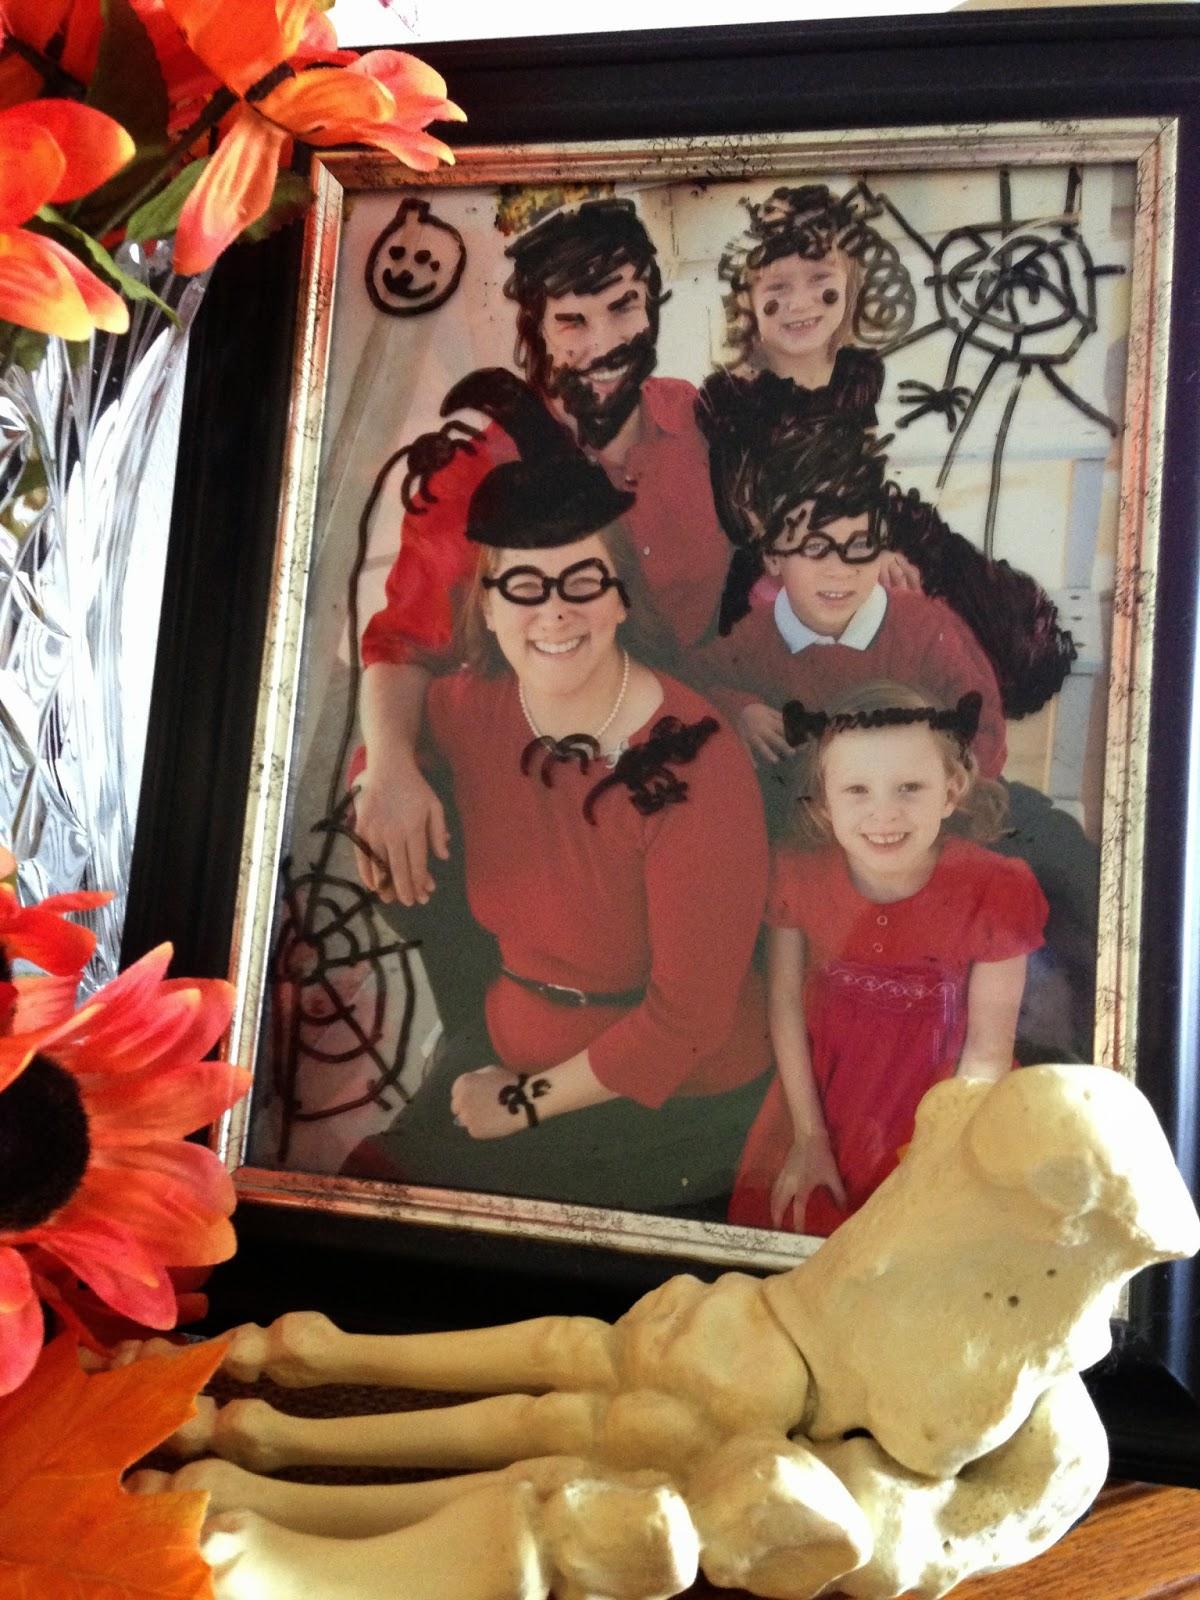 Halloween Home Display...by my nine-year old! See her creative genius! #halloween #homedecor #decorations